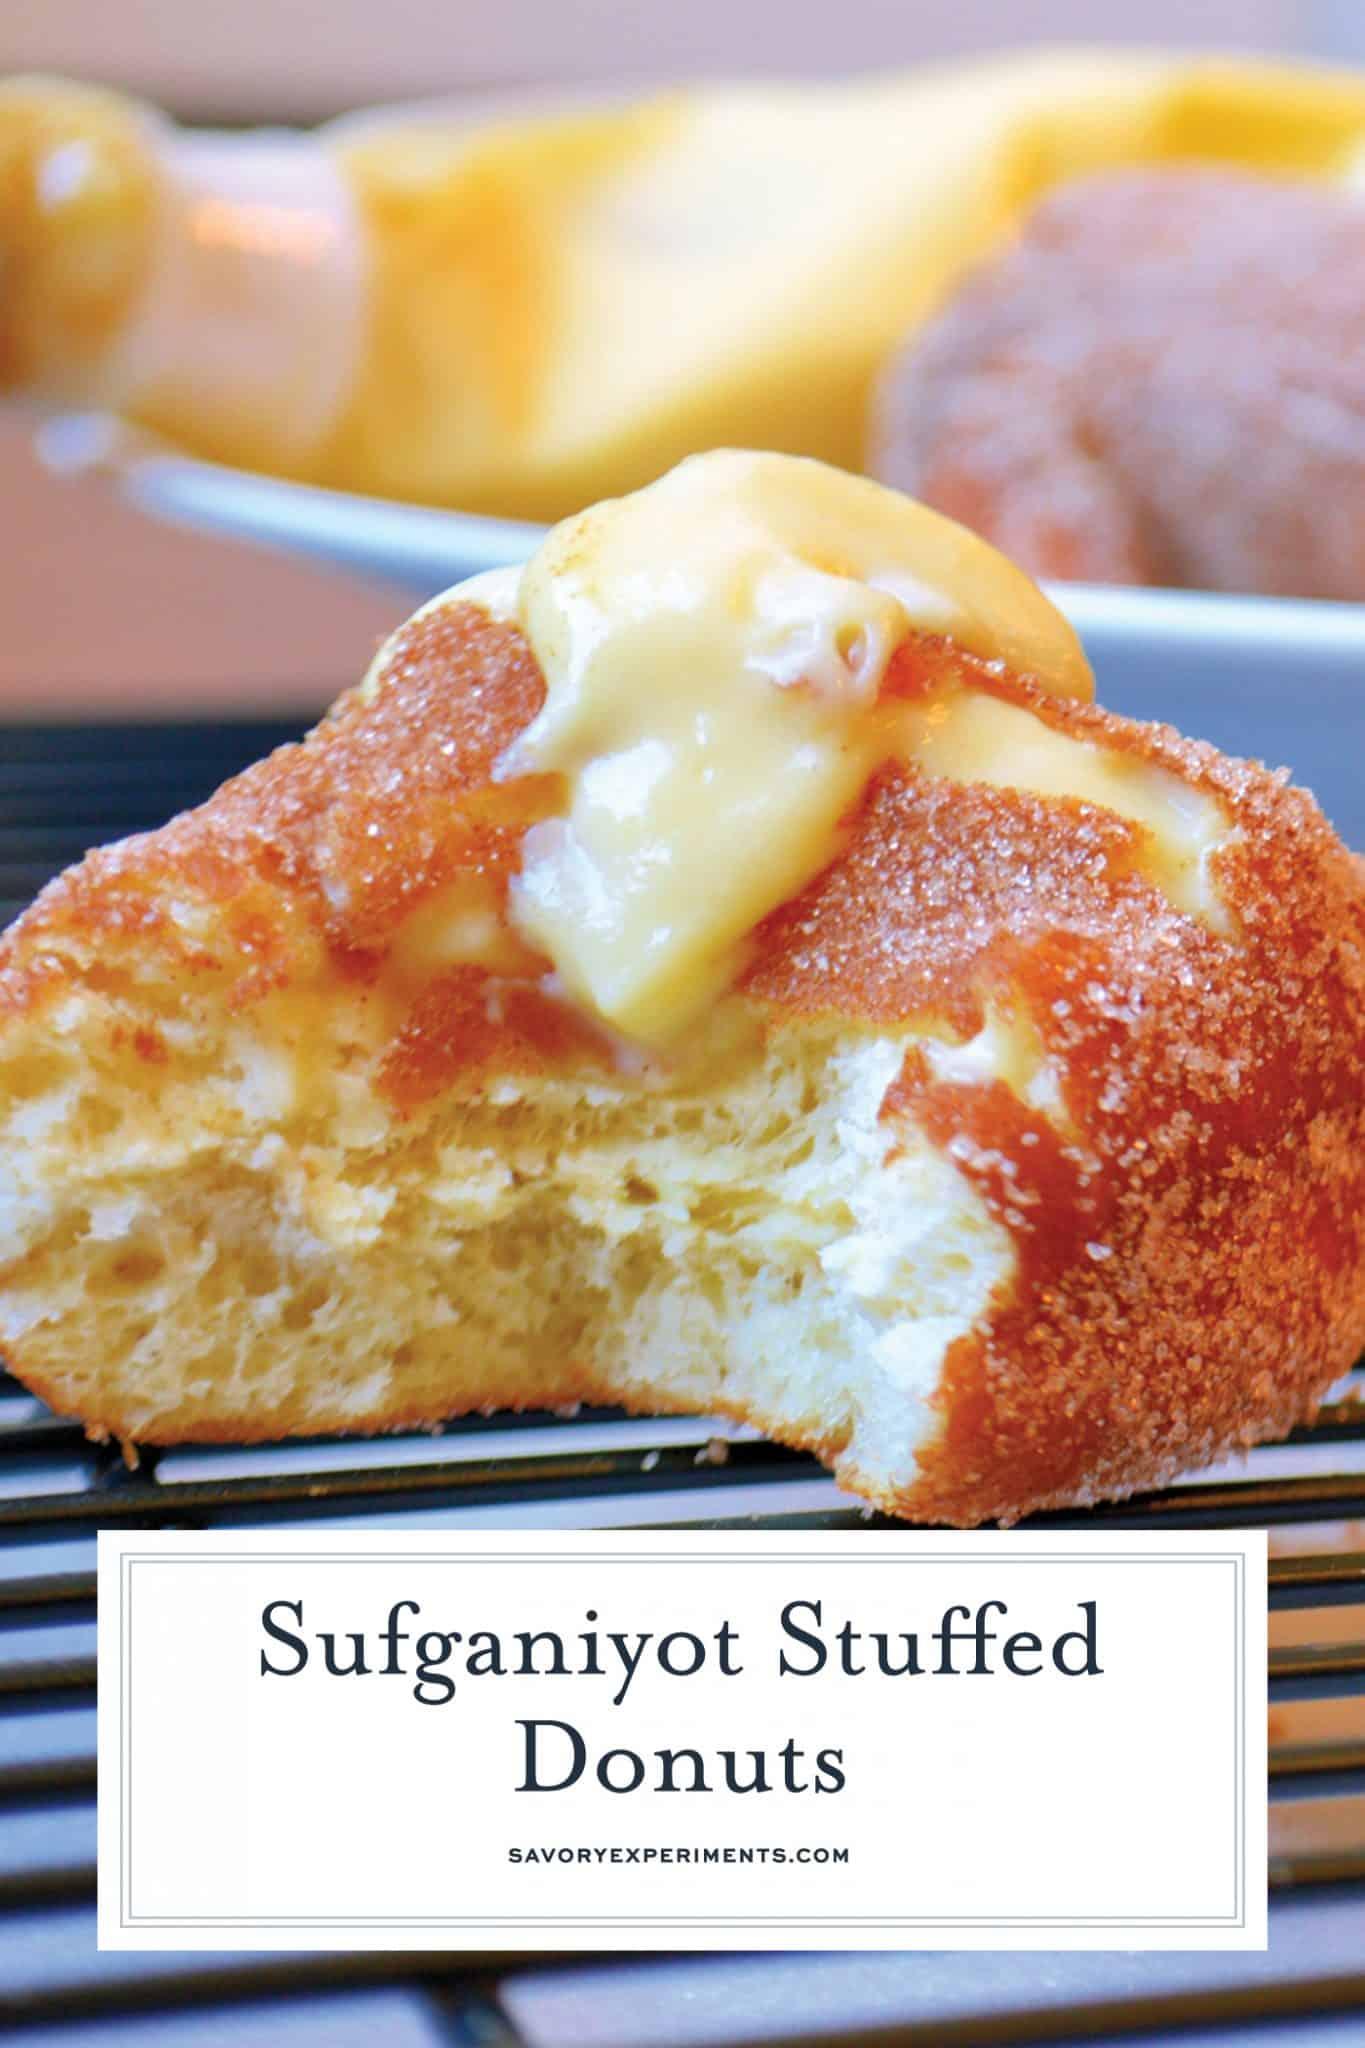 Sufganiyot Stuffed Donuts let you prepare warm & fresh strawberry jelly & vanilla custard stuffed donuts at home! Light & fluffy dough with a hint of sugar! #donutrecipe #stuffeddonuts #easysufganiyotrecipe www.savoryexperiments.com